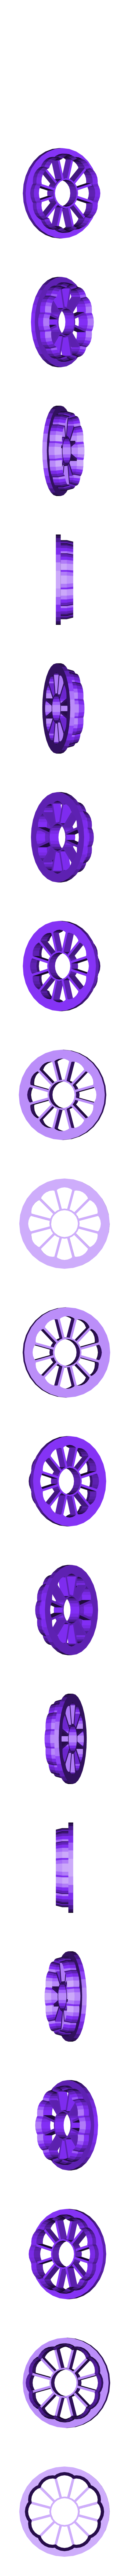 jammie_dodgers_low_profile_bottom.stl Download free STL file Jammie dodger cutter low profile remix • 3D printing design, procreator3D